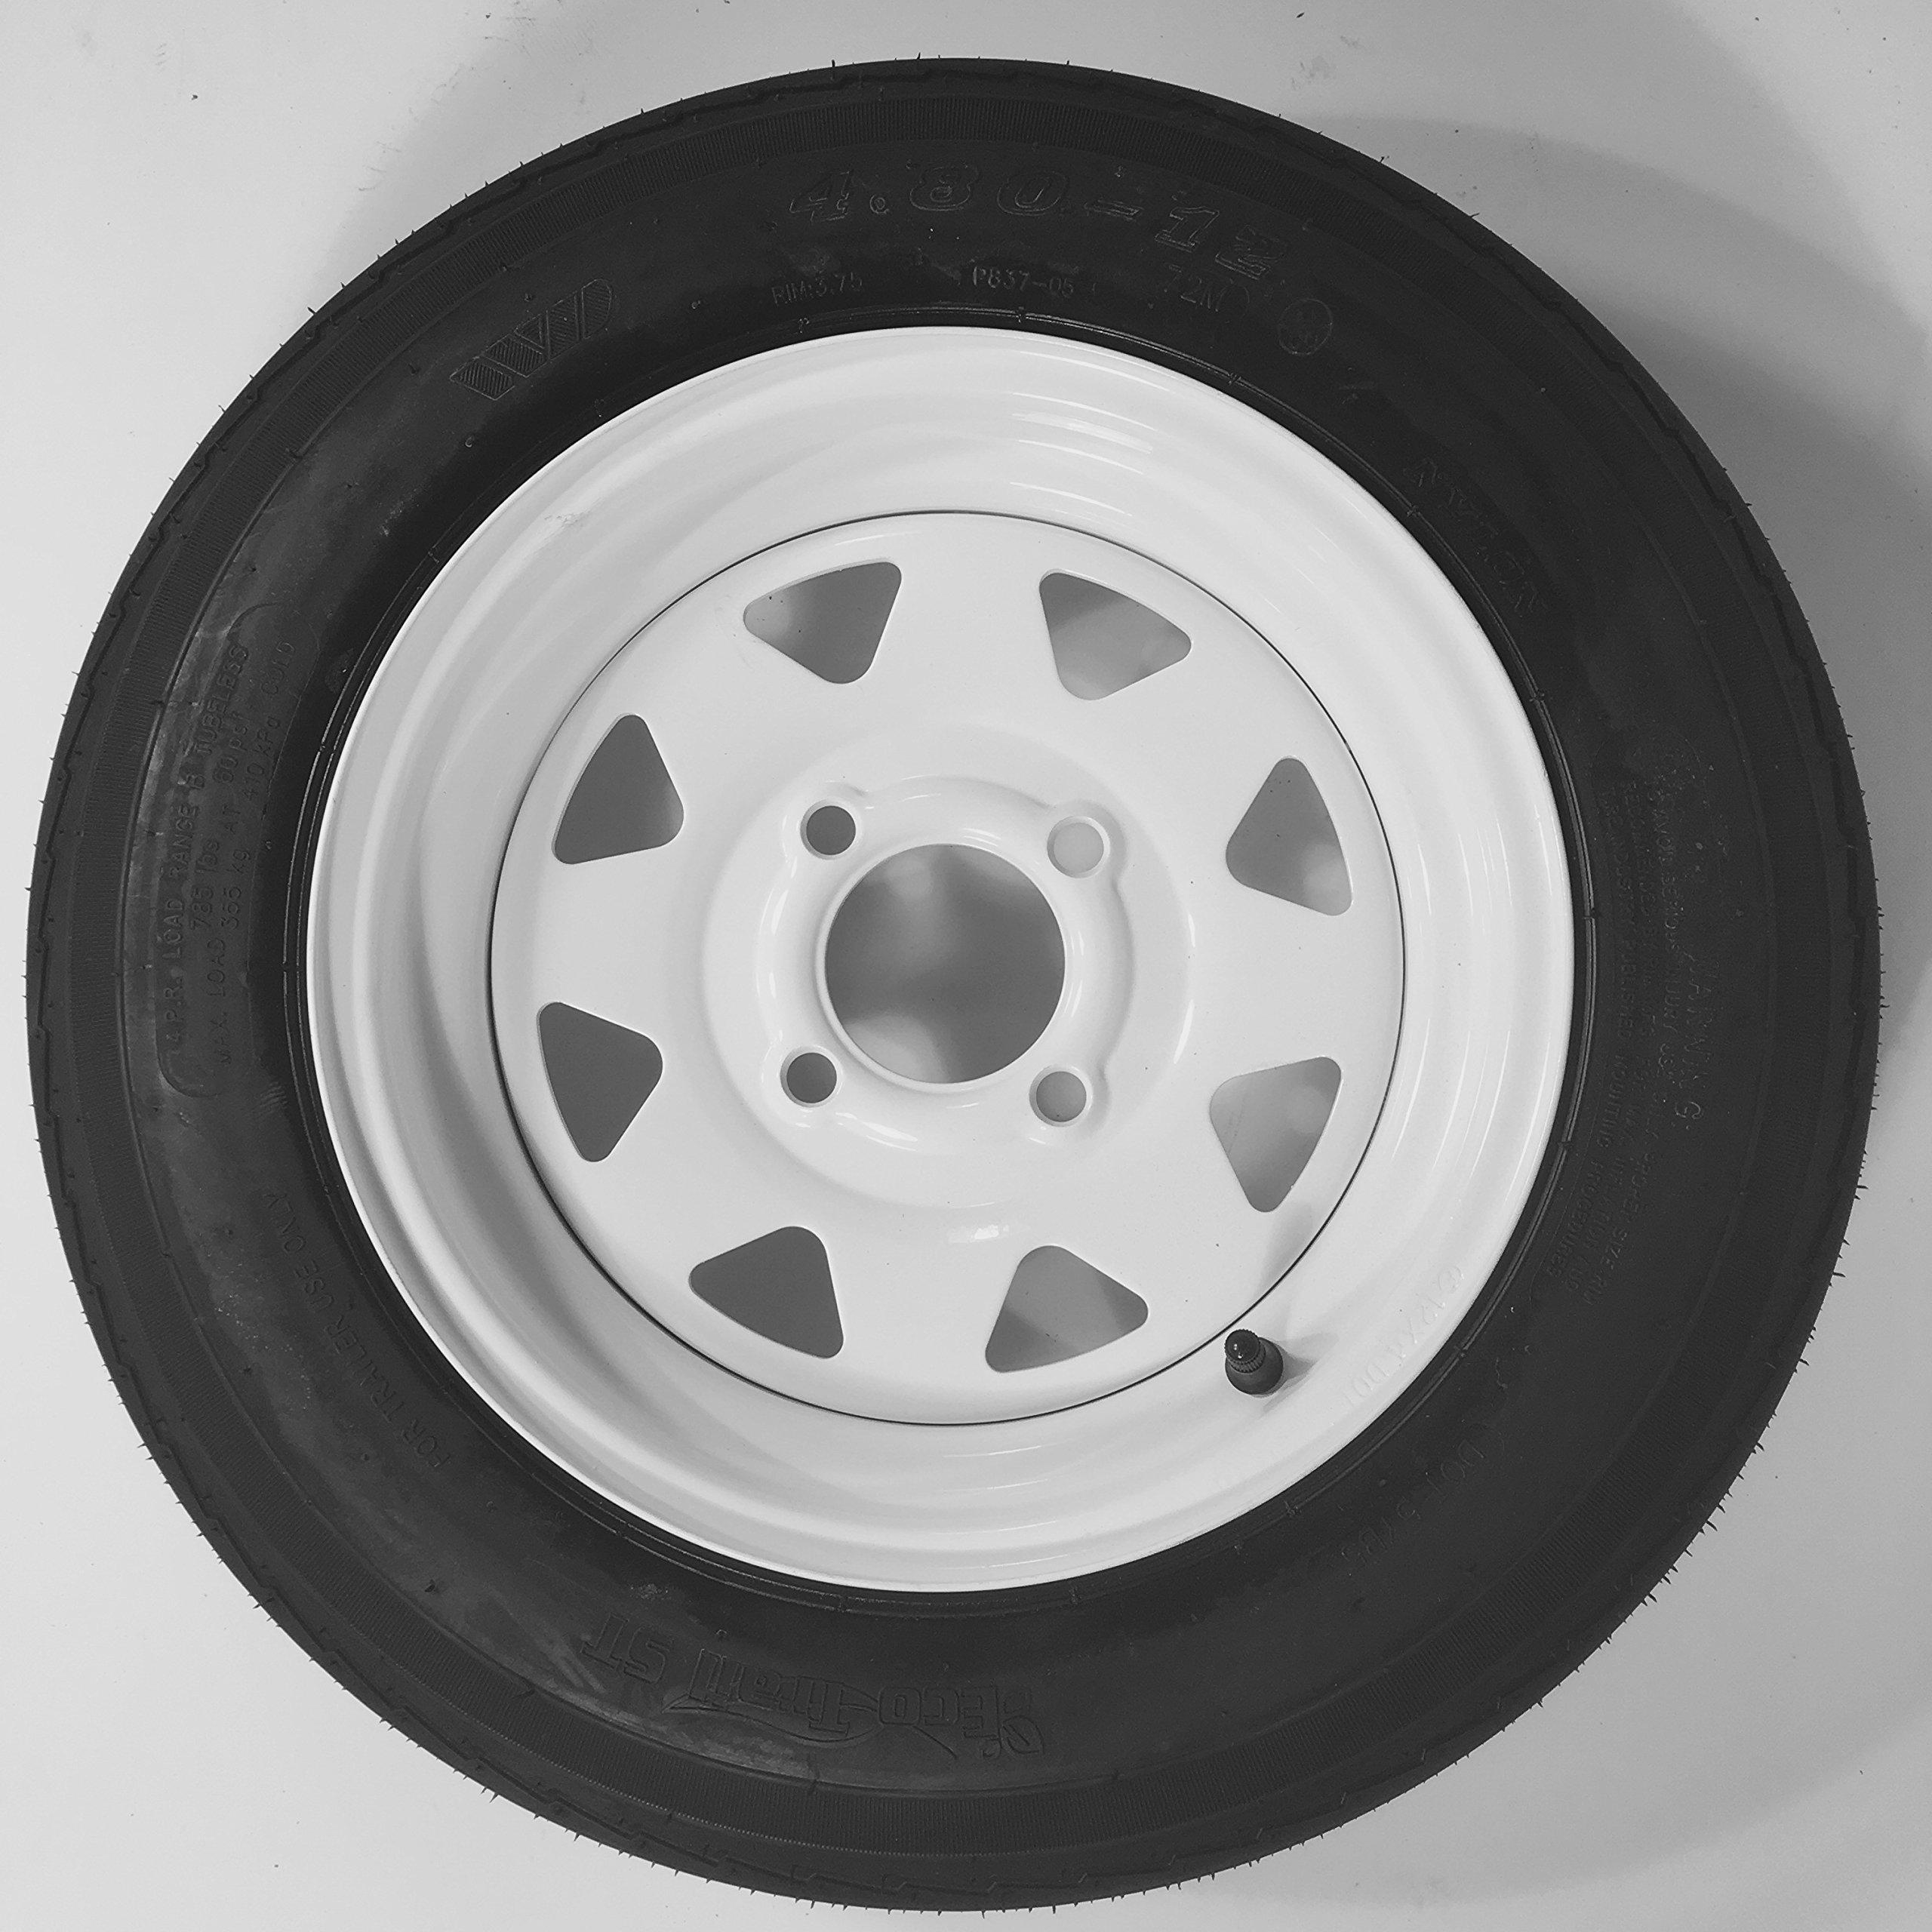 eCustomRim Trailer Tire + Rim 4.80-12 480-12 4.80 X 12 12'' LRB 4 Lug White Wheel Spoke